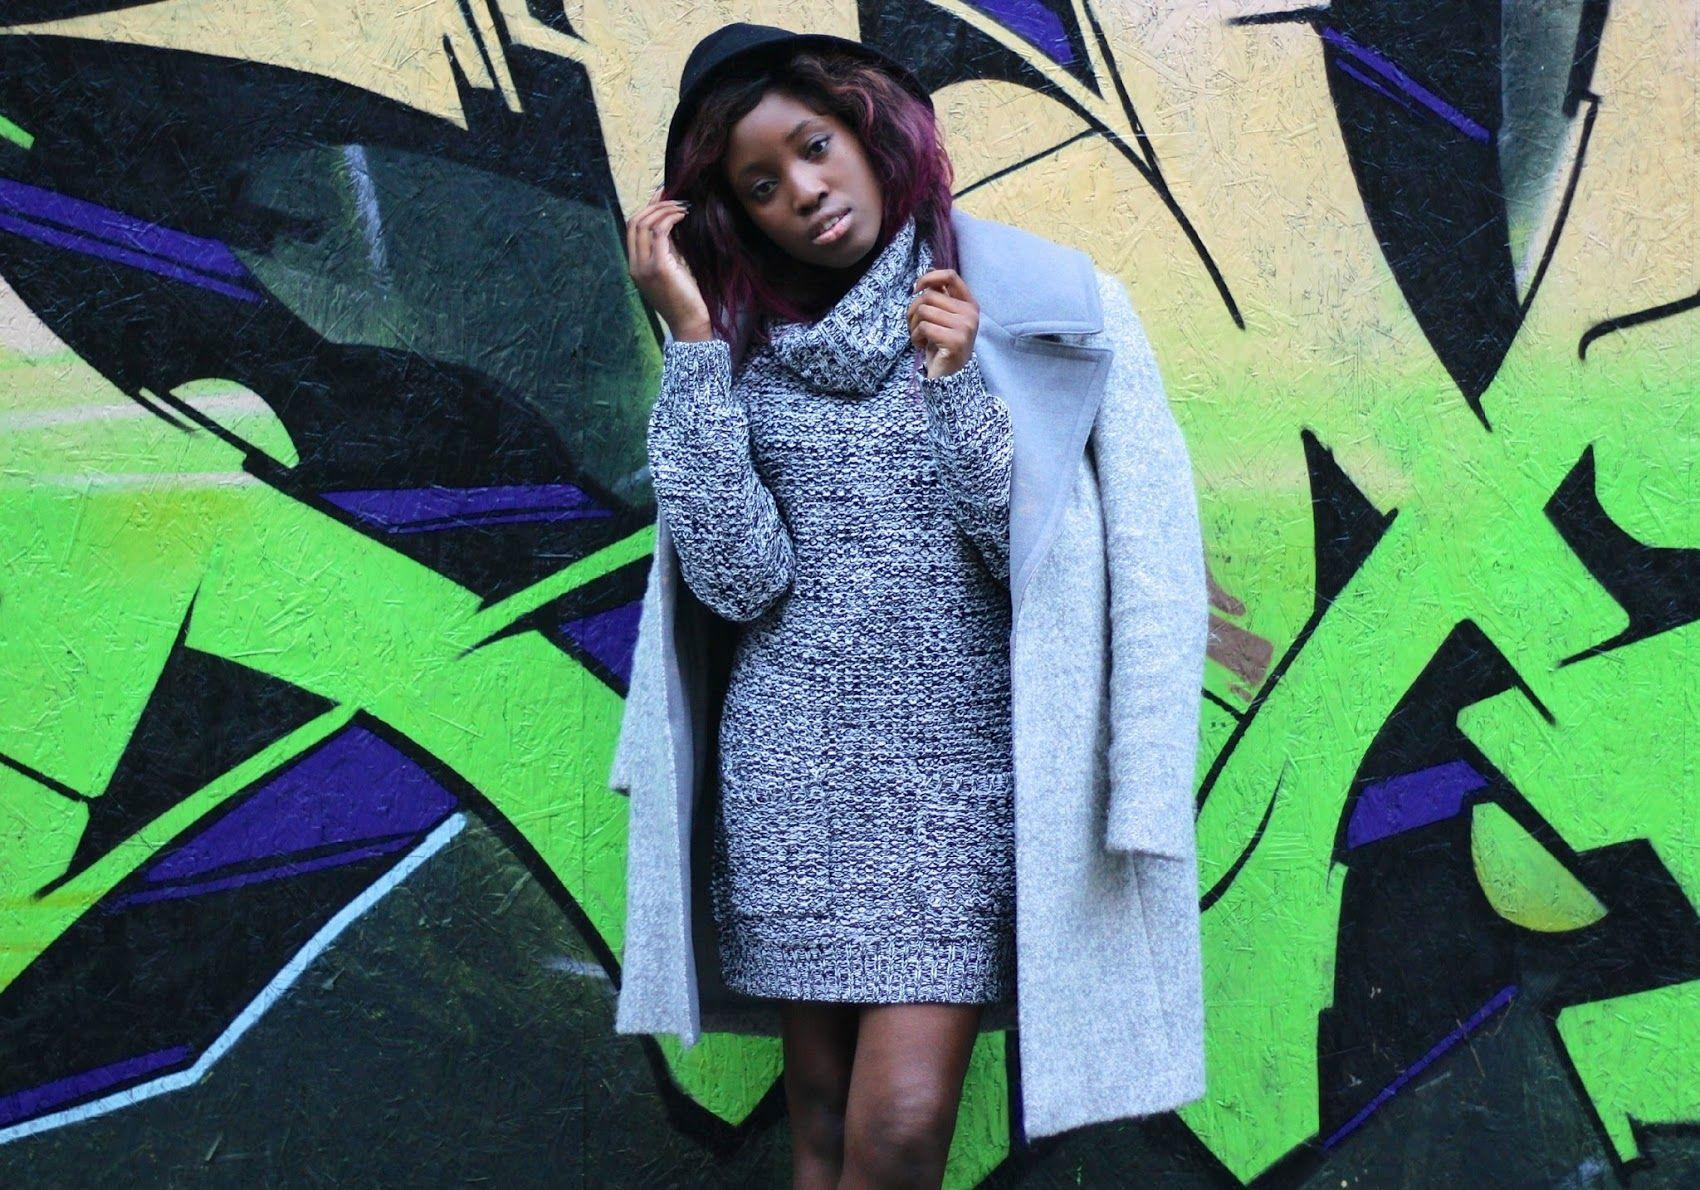 "Foto: Reprodução / <a href=""http://www.thefashionhaven.com/2014/12/greyscale.html"" target=""_blank"">The Fashion Haven</a>"